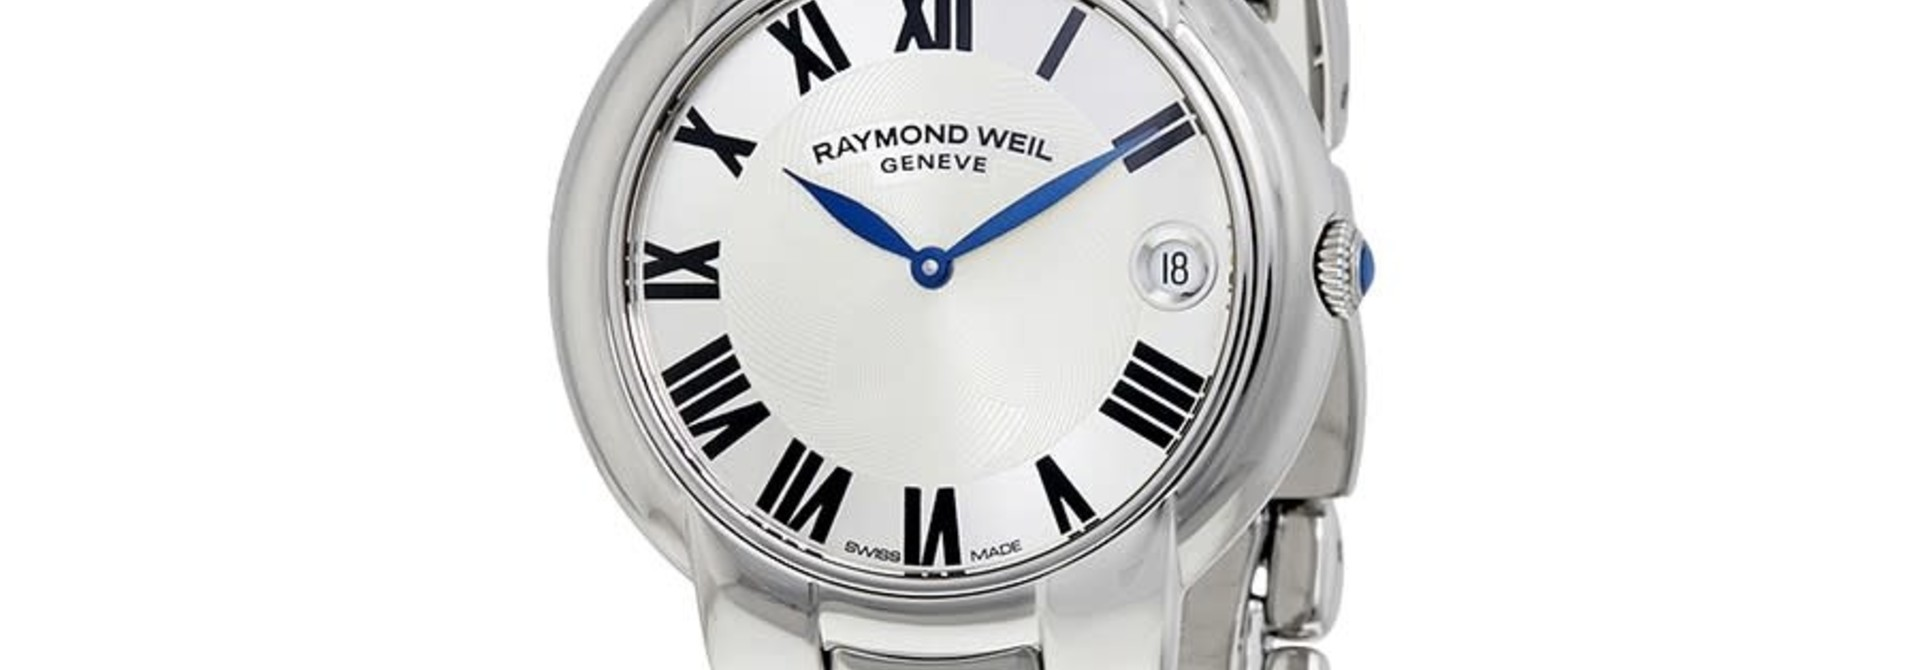 Raymond Weil Jasmine 5235 -St -01659.